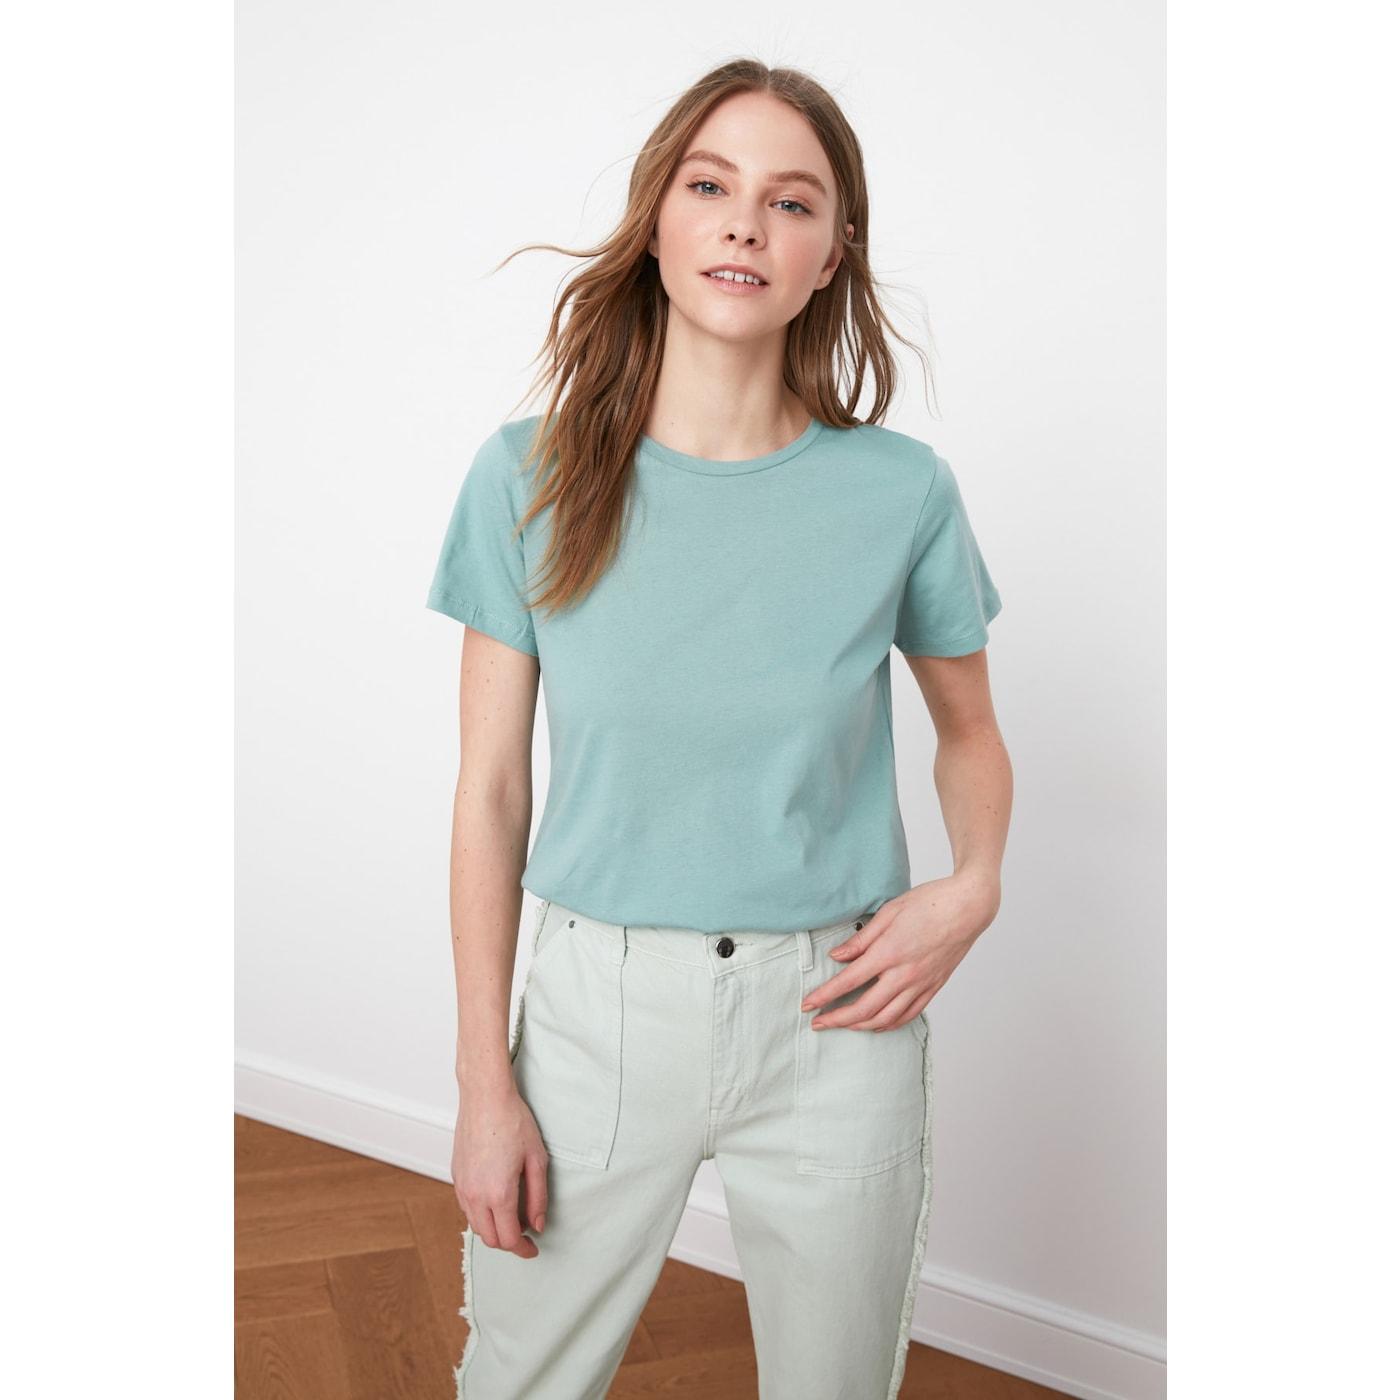 Trendyol Mint 100% Cotton Süprem Bicycle Collar Basic Knitted T-Shirt dámské M